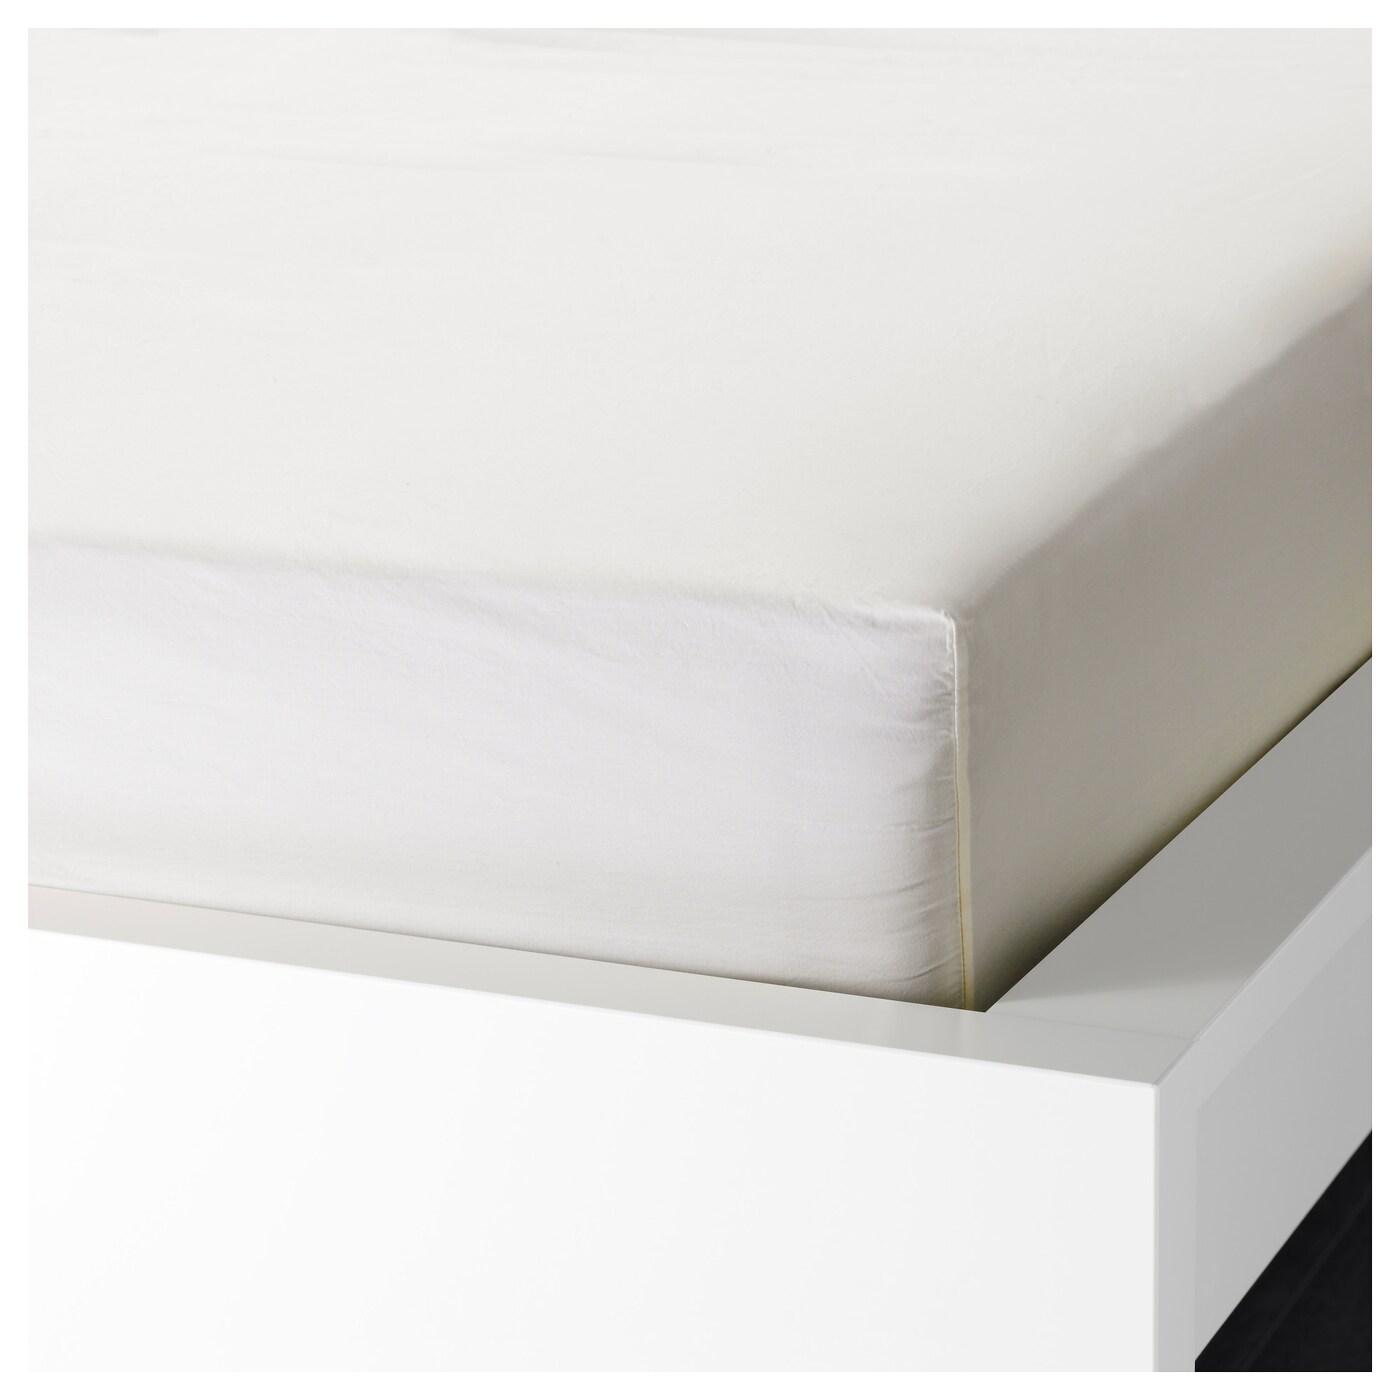 s mntuta hoeslaken wit 160x200 cm ikea. Black Bedroom Furniture Sets. Home Design Ideas